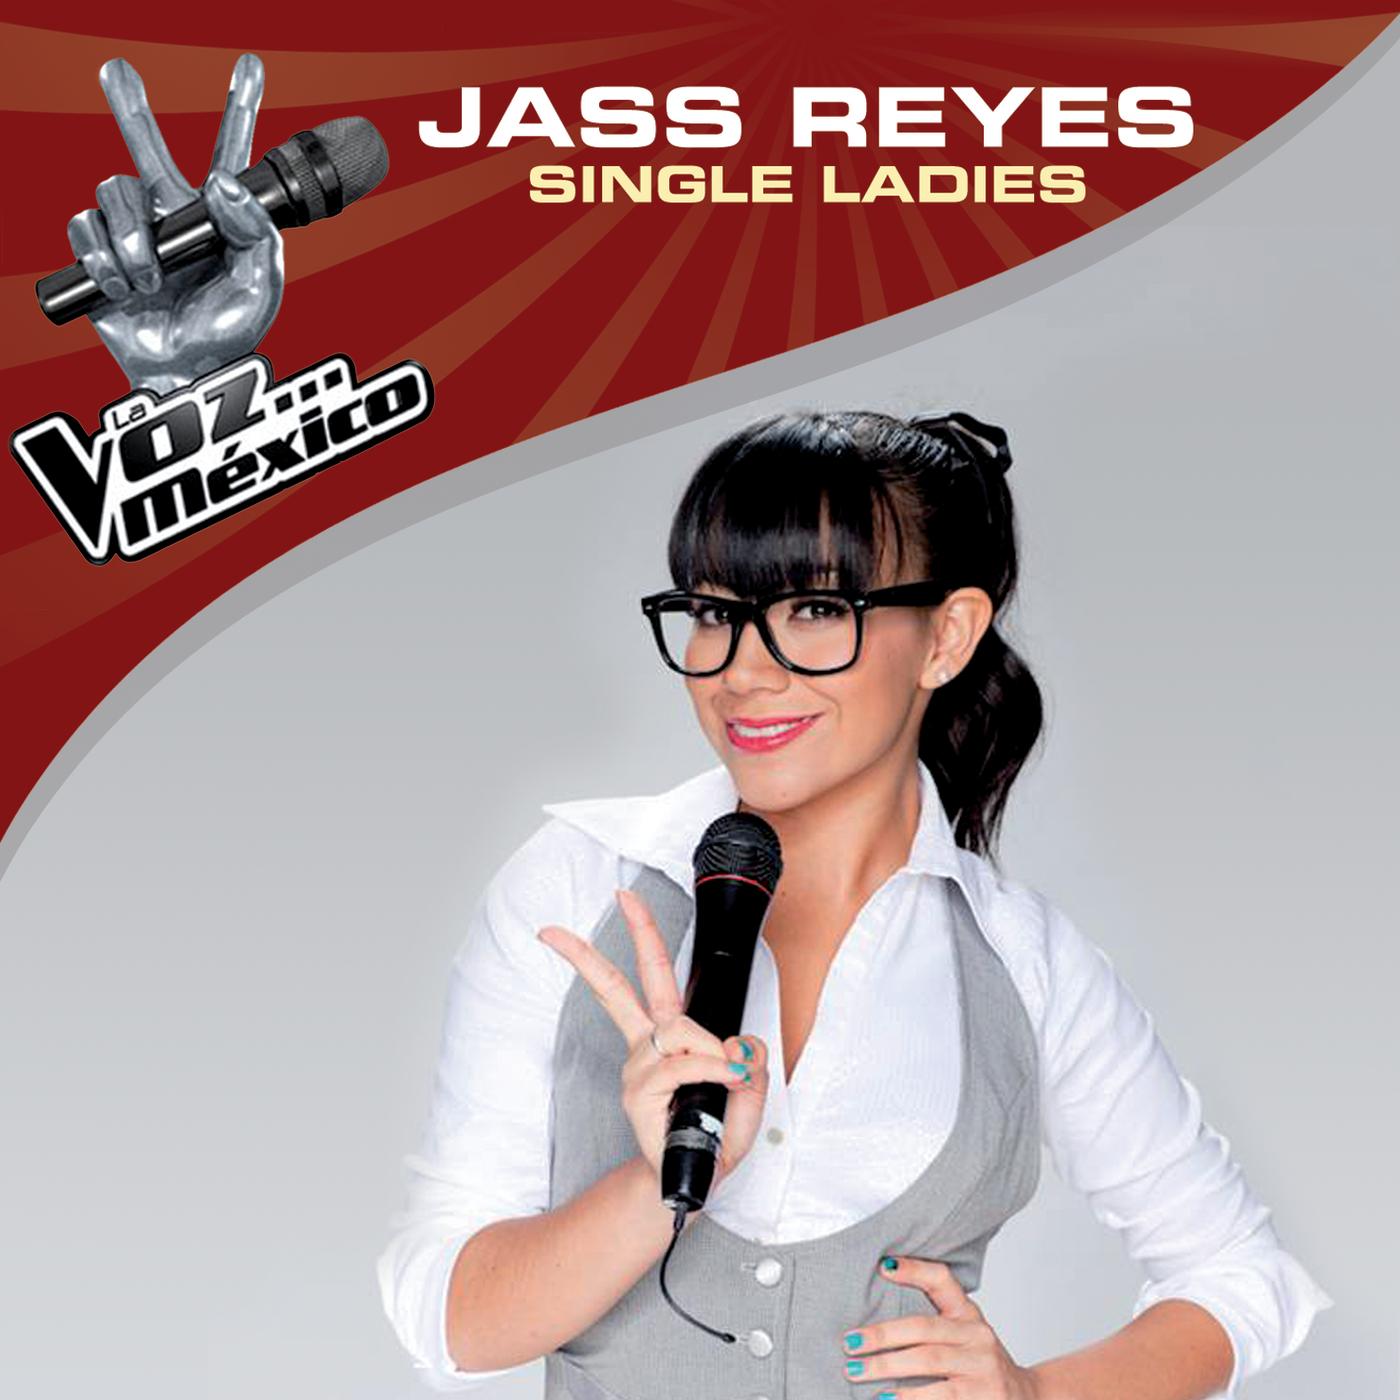 Jass Reyes